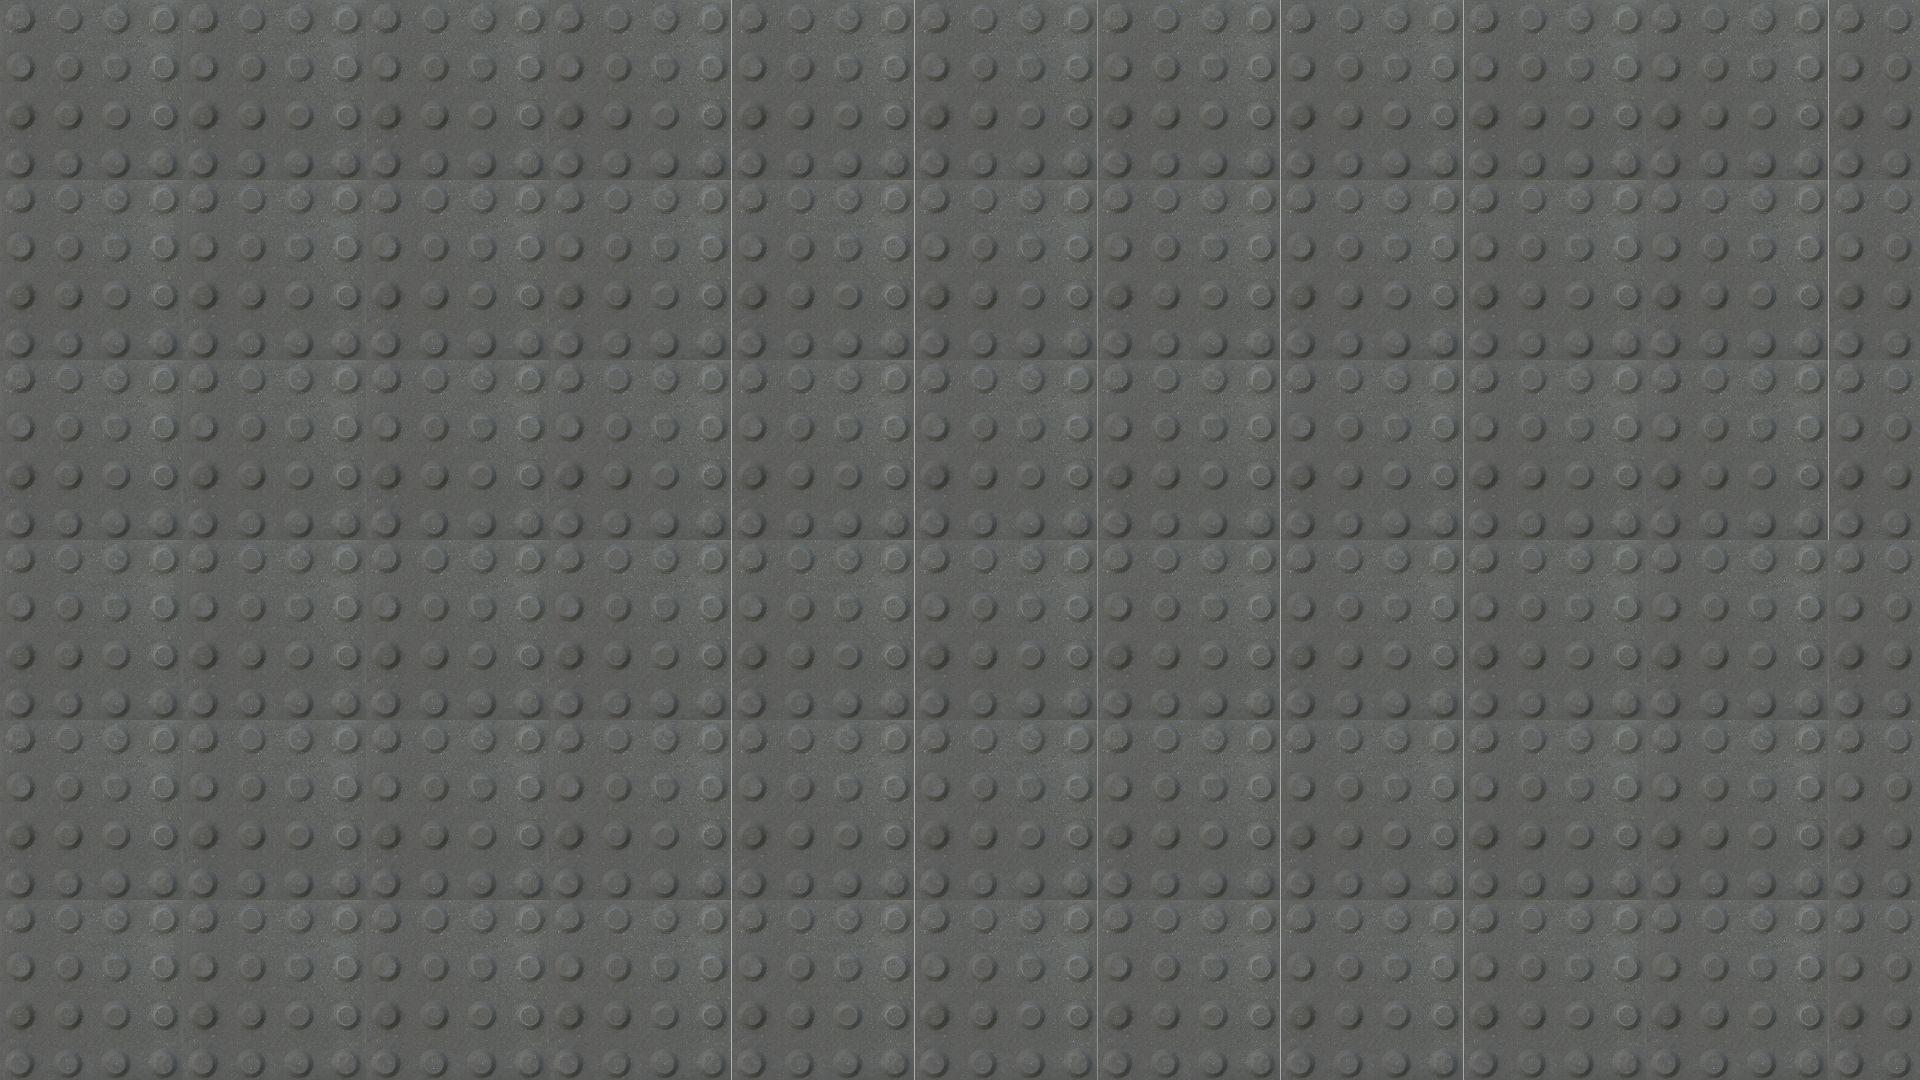 baldosa táctil 16 botones gris 20x20x3 cm